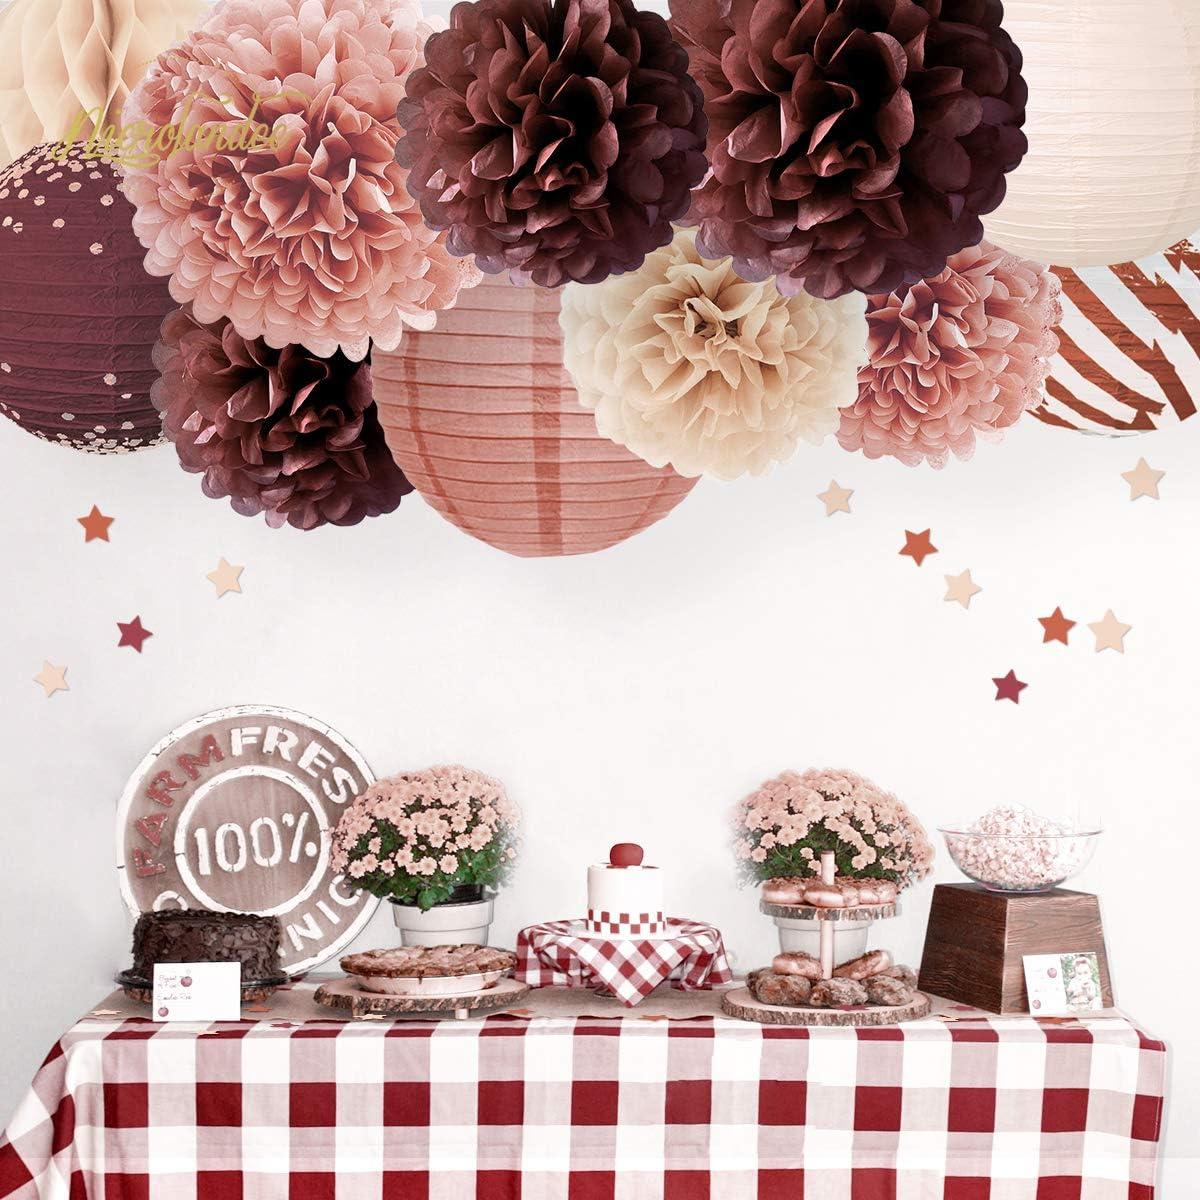 12PCS Elegant Cinnamon Rose Paper Lanterns Tissue Pom Pom Table Confetti for Valentines Day Fall in Love Wedding Birthday Bridal Shower Party Decor NICROLANDEE Wedding Party Decorations